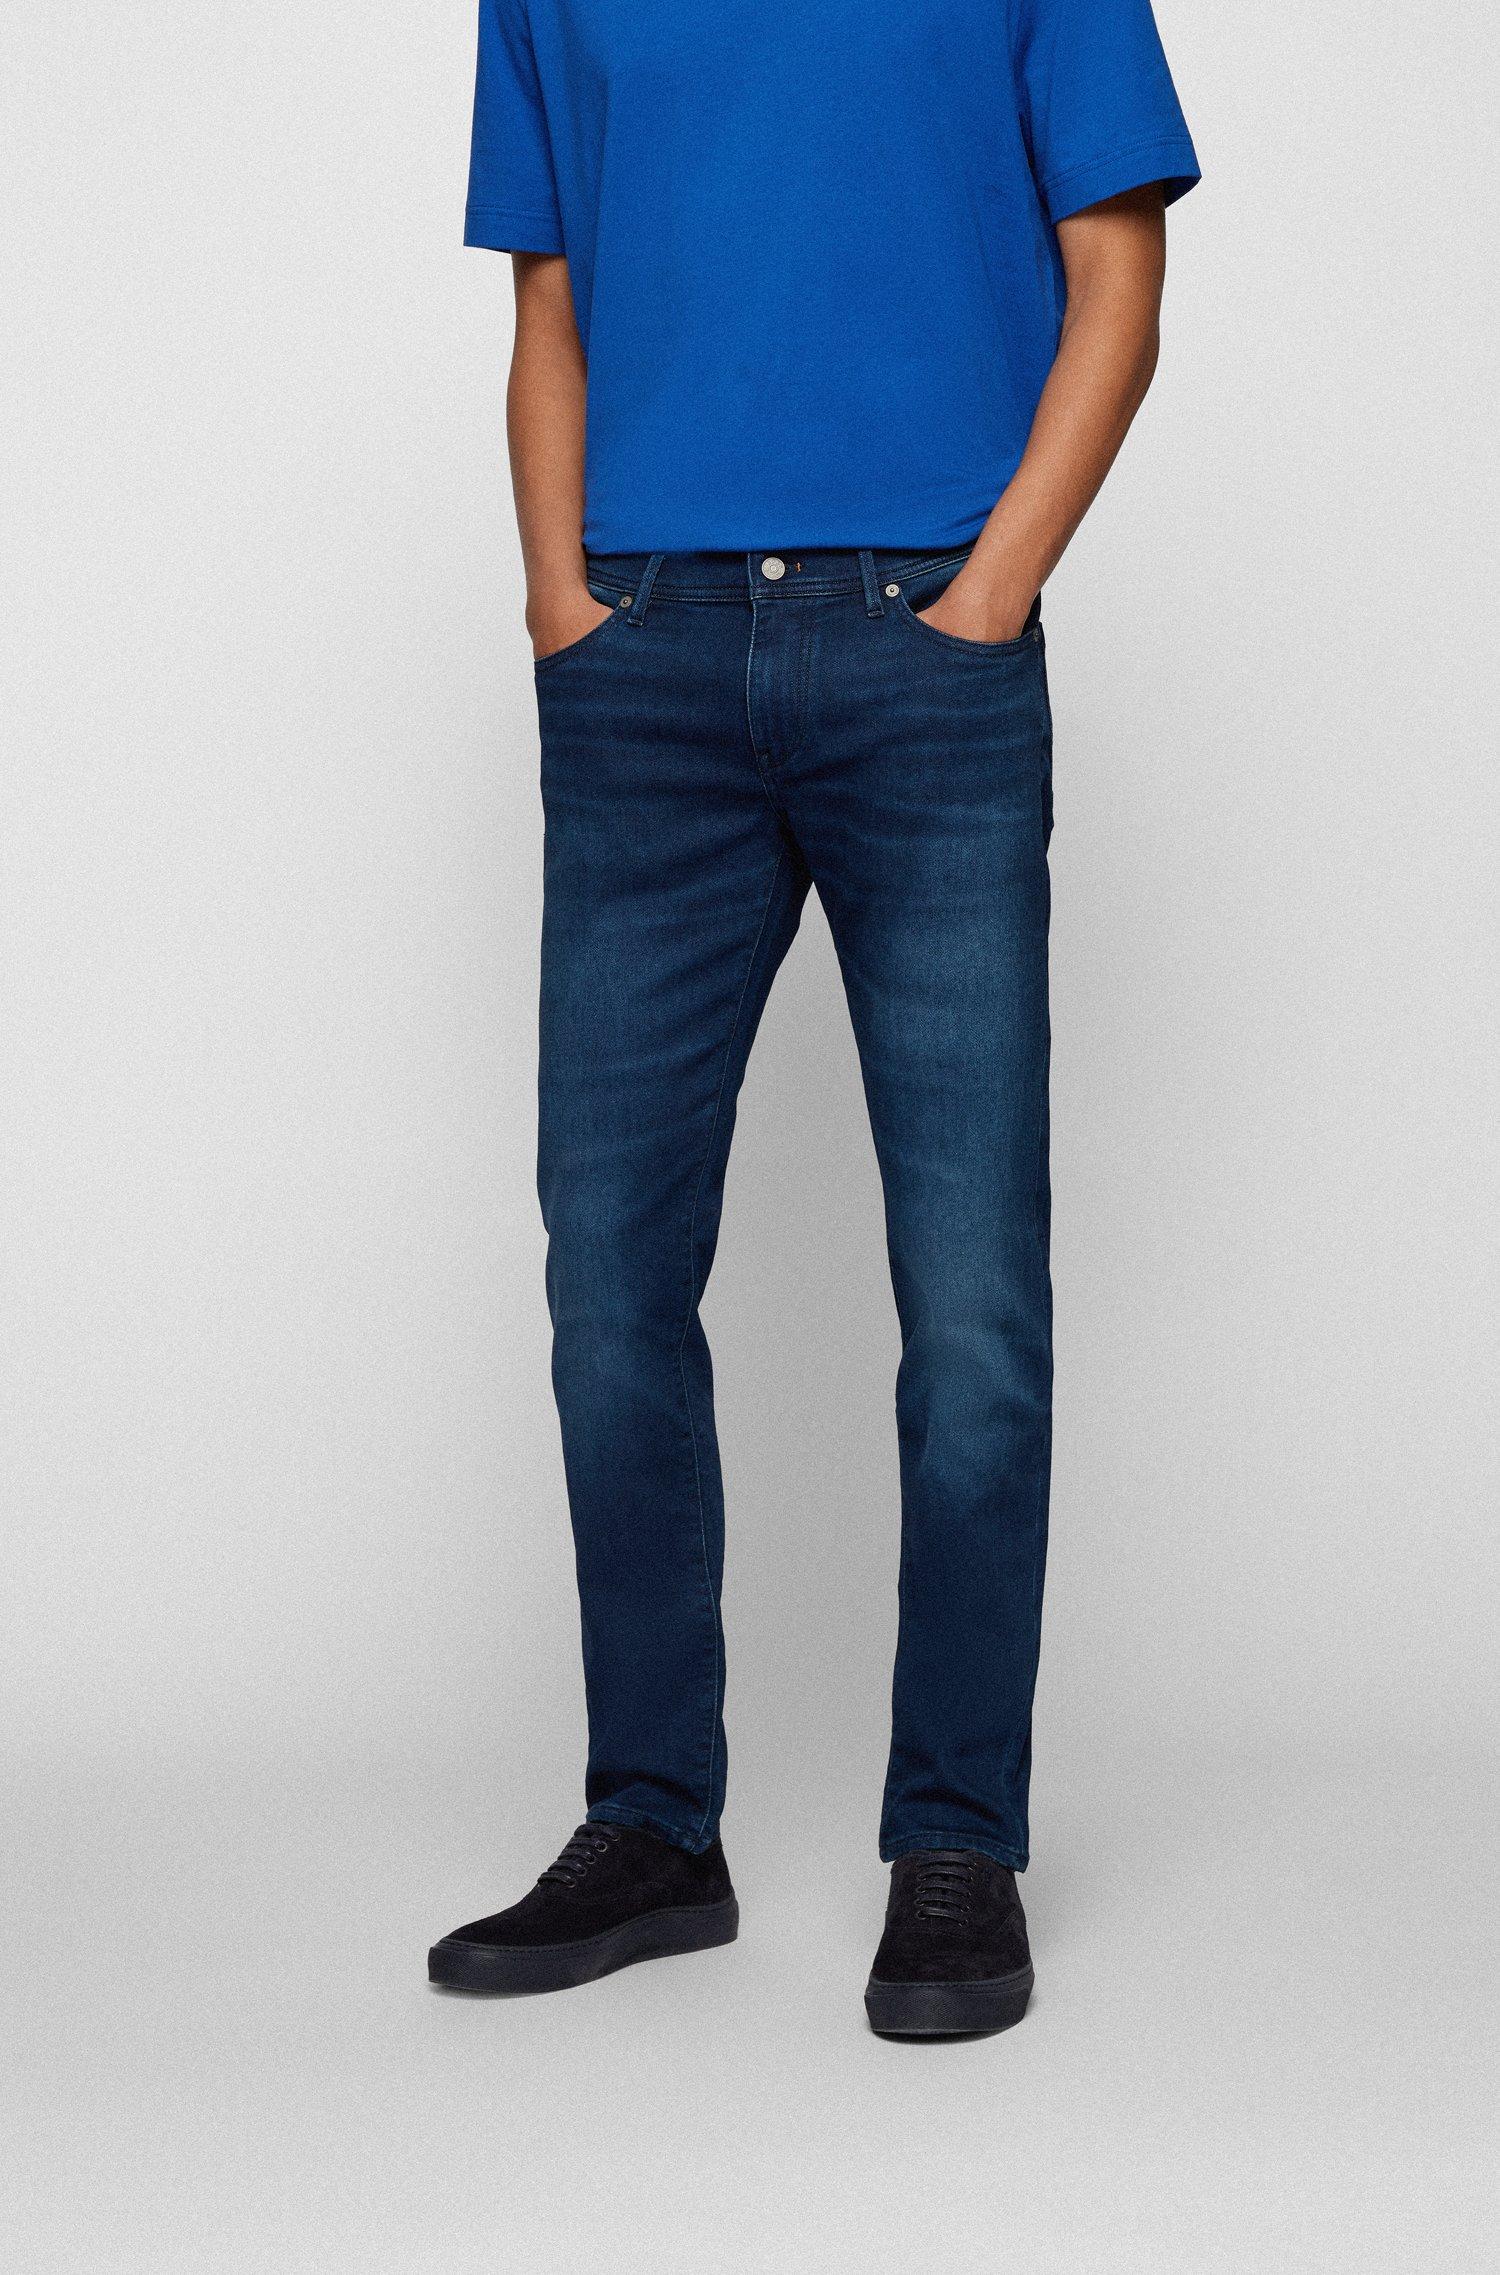 Skinny-fit jeans in dark-blue cosy-knit denim, Dark Blue